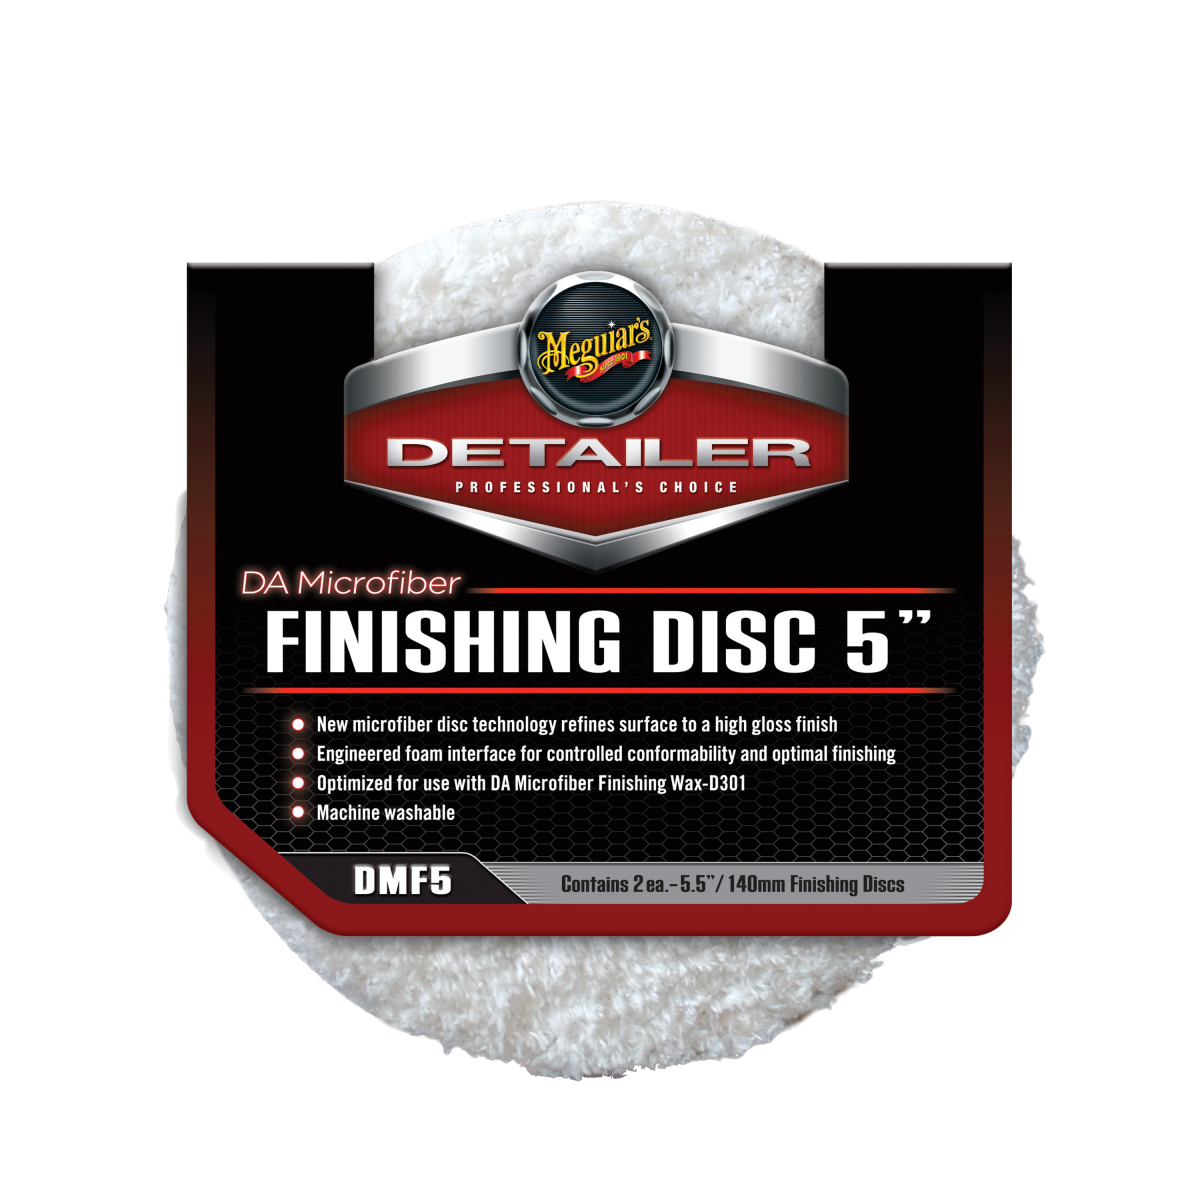 "Meguiar's DA Microfiber Finishing Disc 5"""